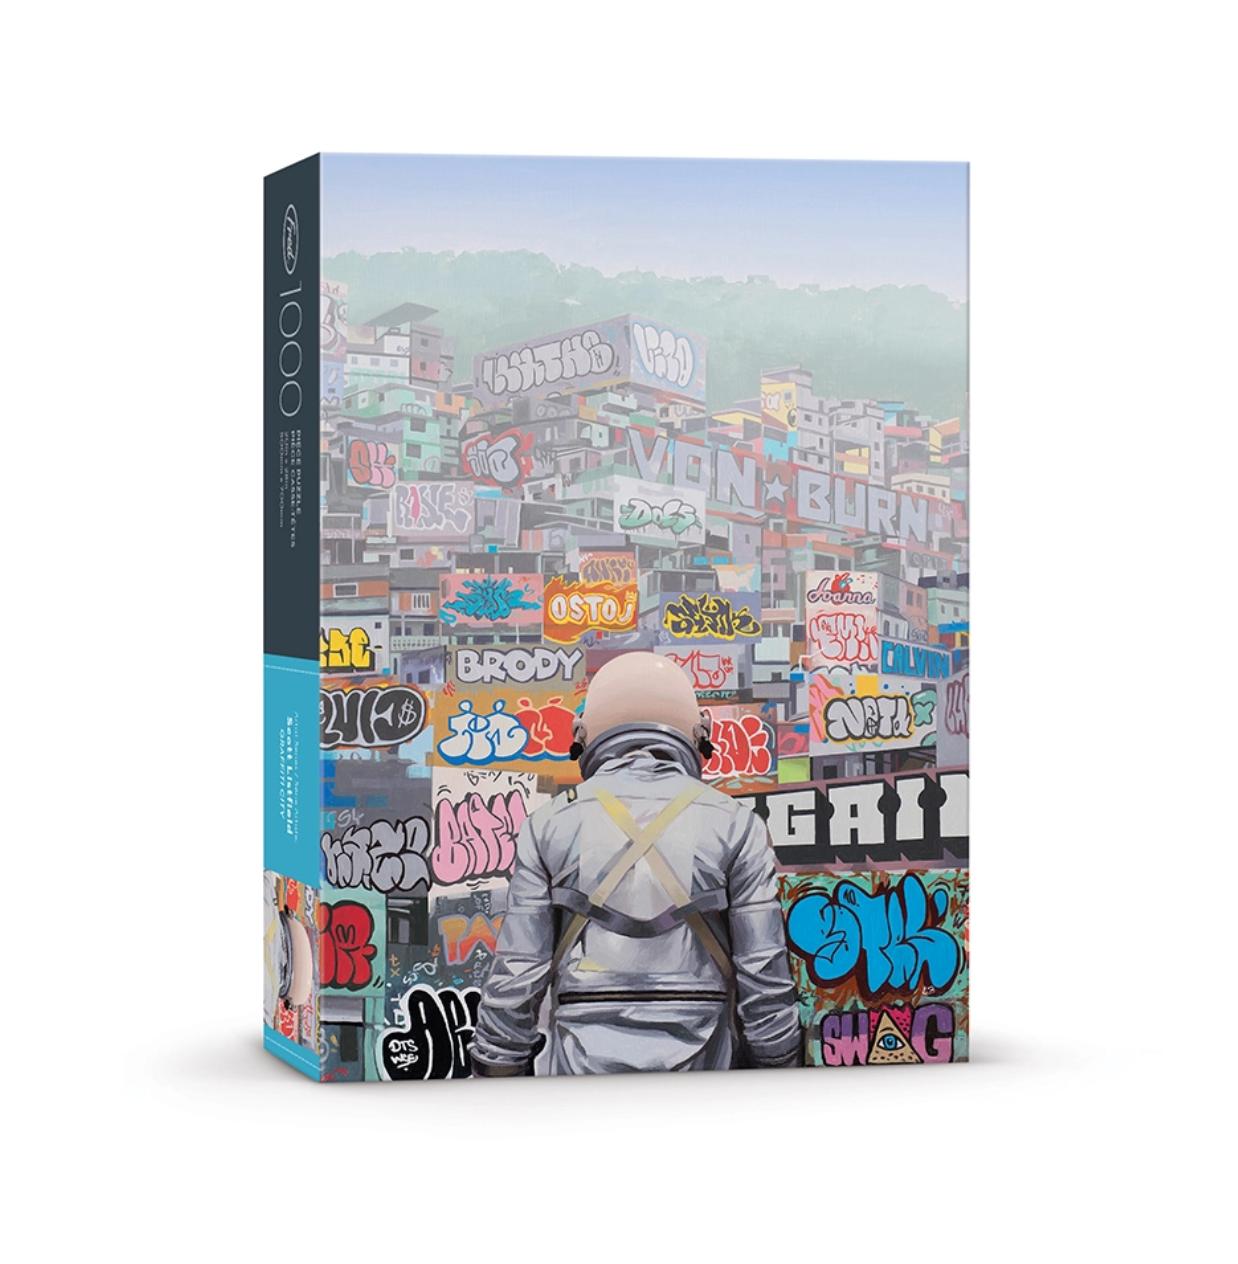 Fred & Friends Scott Listfield- Graffiti City Puzzle-1000 PC